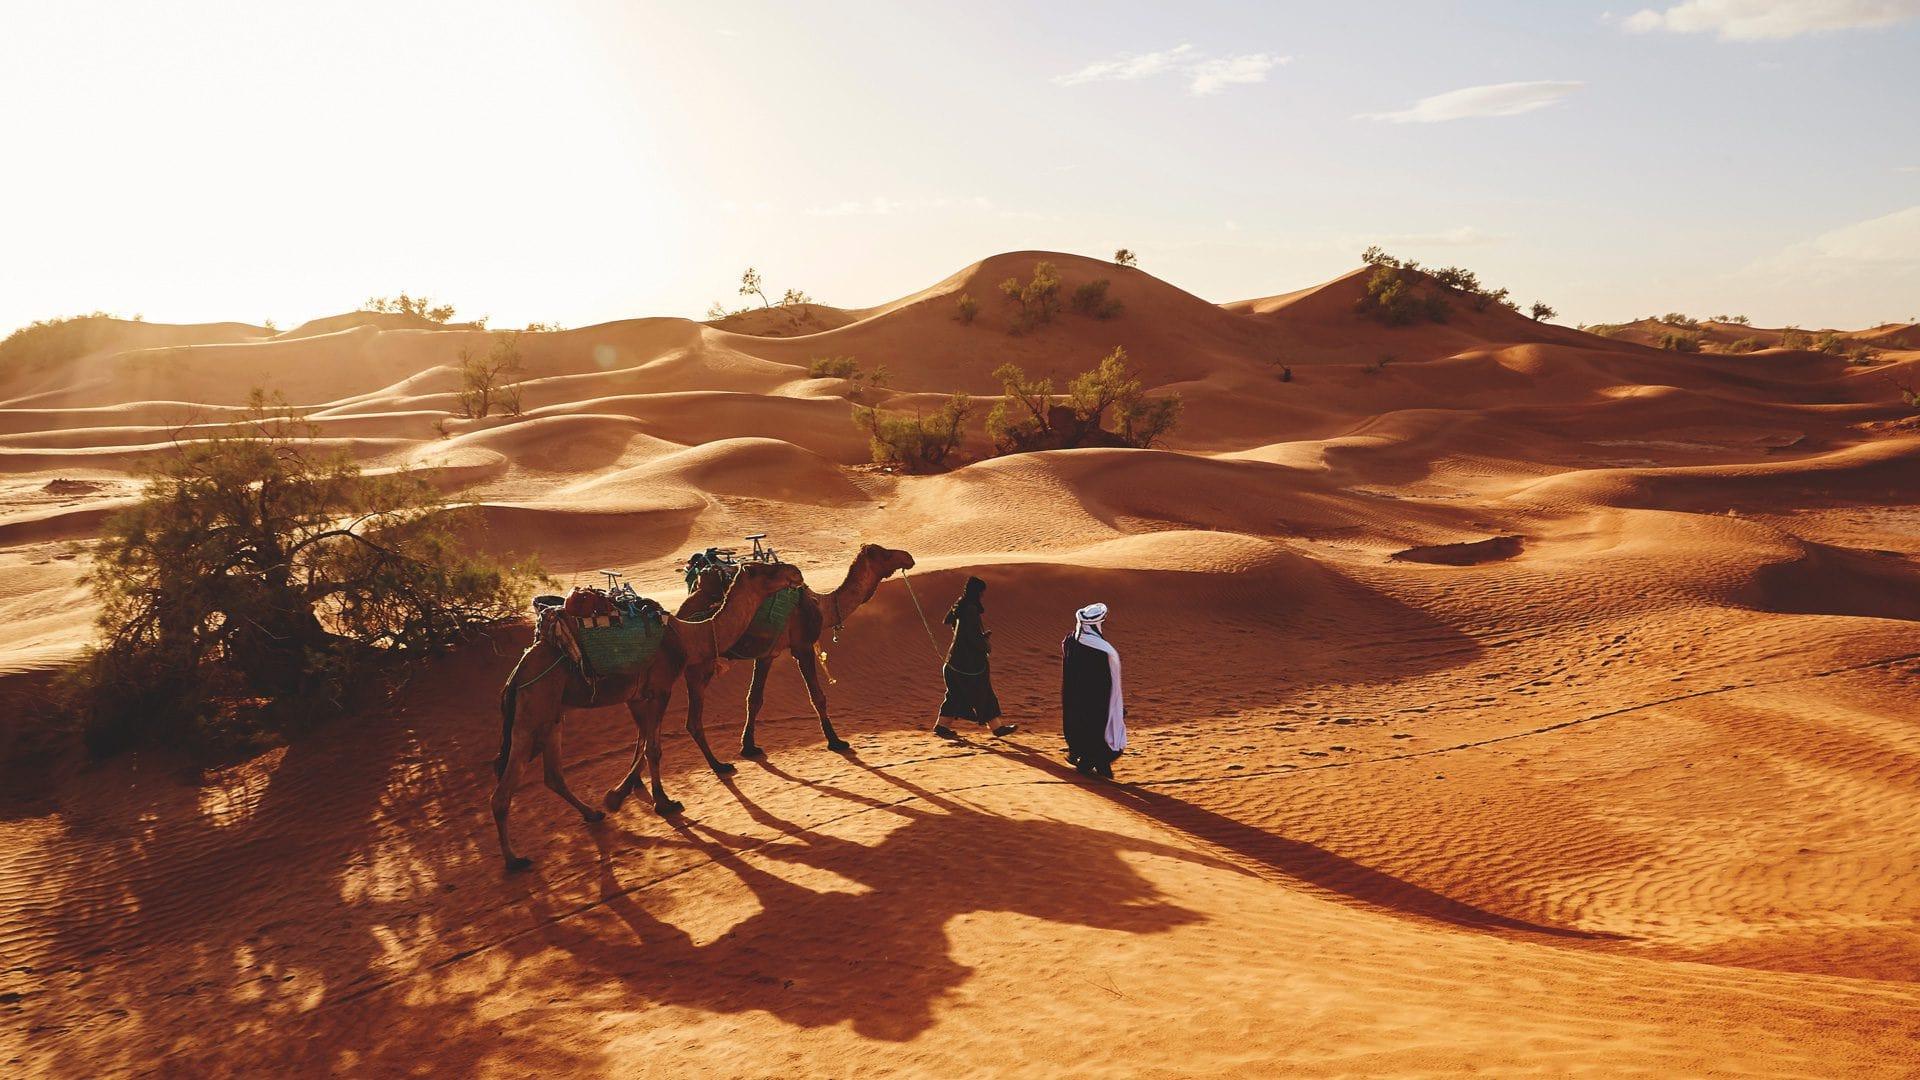 Desierto Neguev Israel | Rojo Cangrejo Blog de Viajes